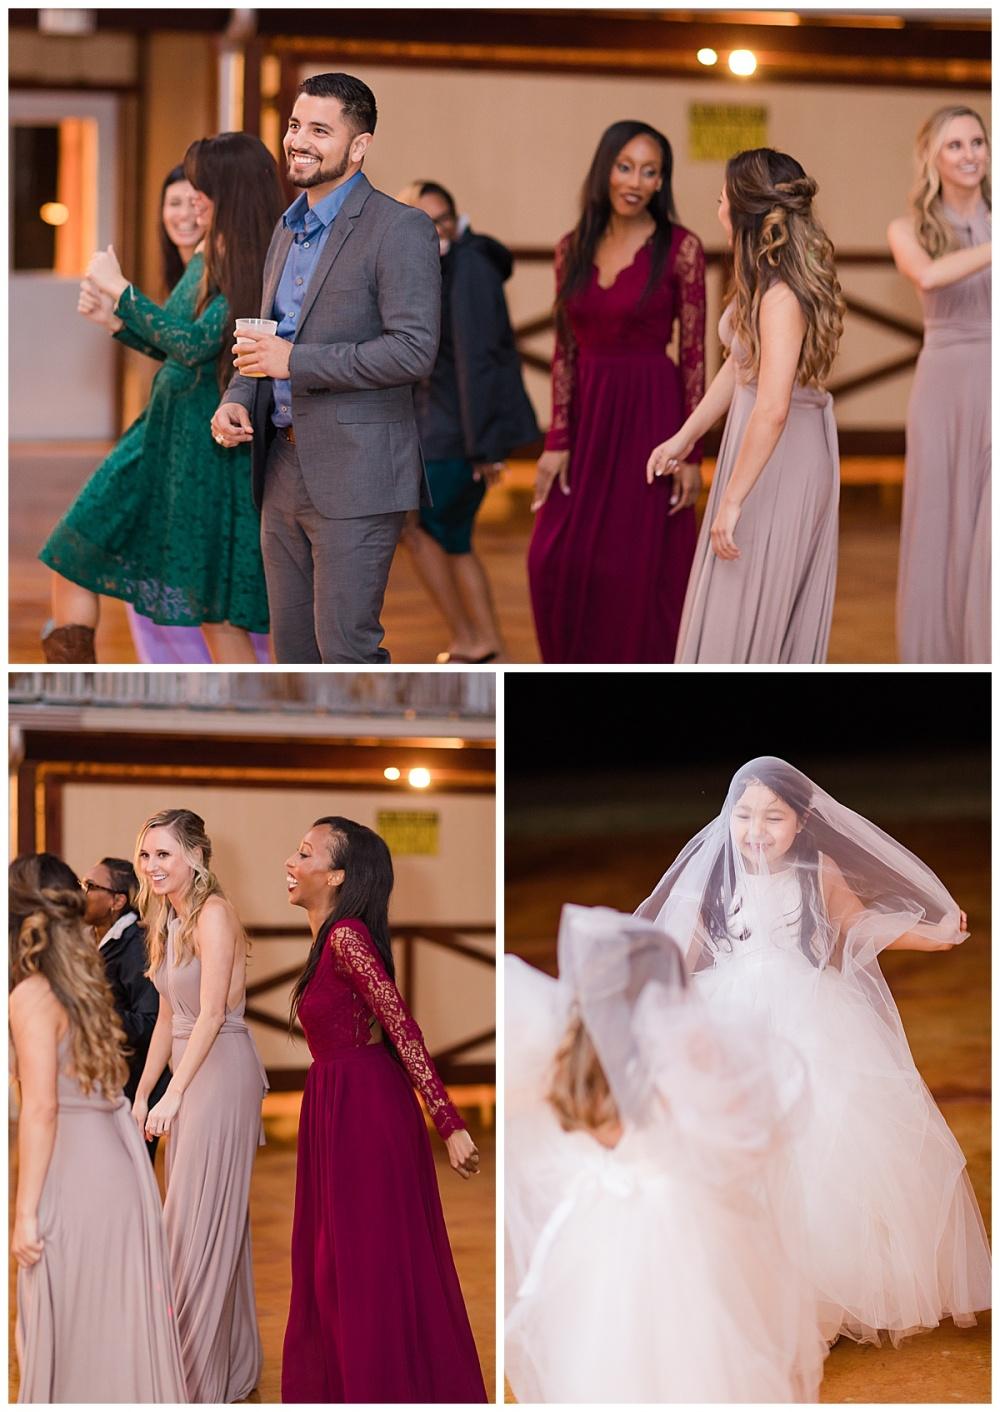 Wedding-Photographer-Texas-Hill-Country-Happy-H-Ranch-Comfor-Texas-Carly-Barton-Photography_0091.jpg